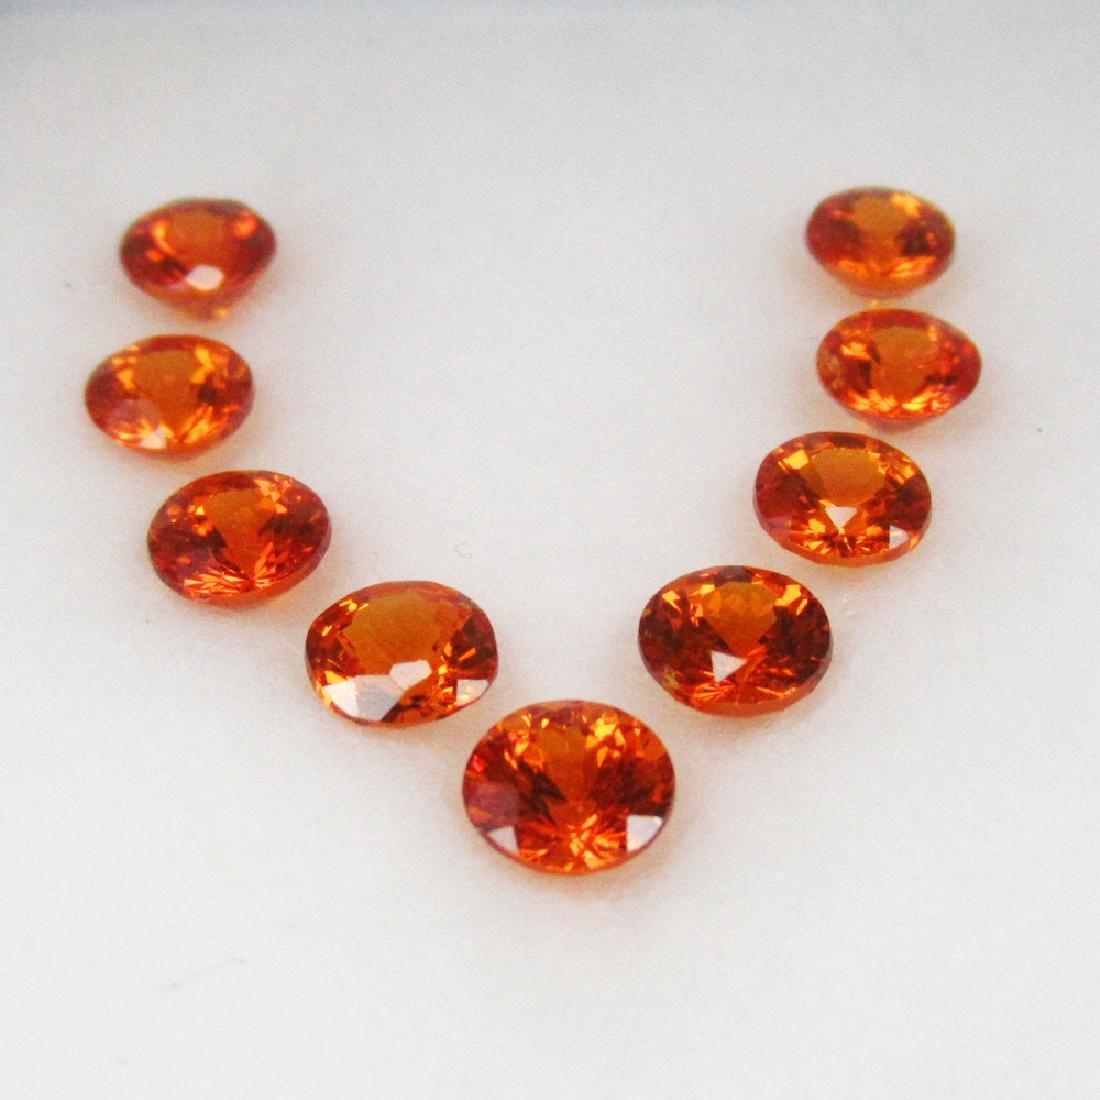 4.69 Ct 9 Loose Spessartine Garnet Necklace Set - 2